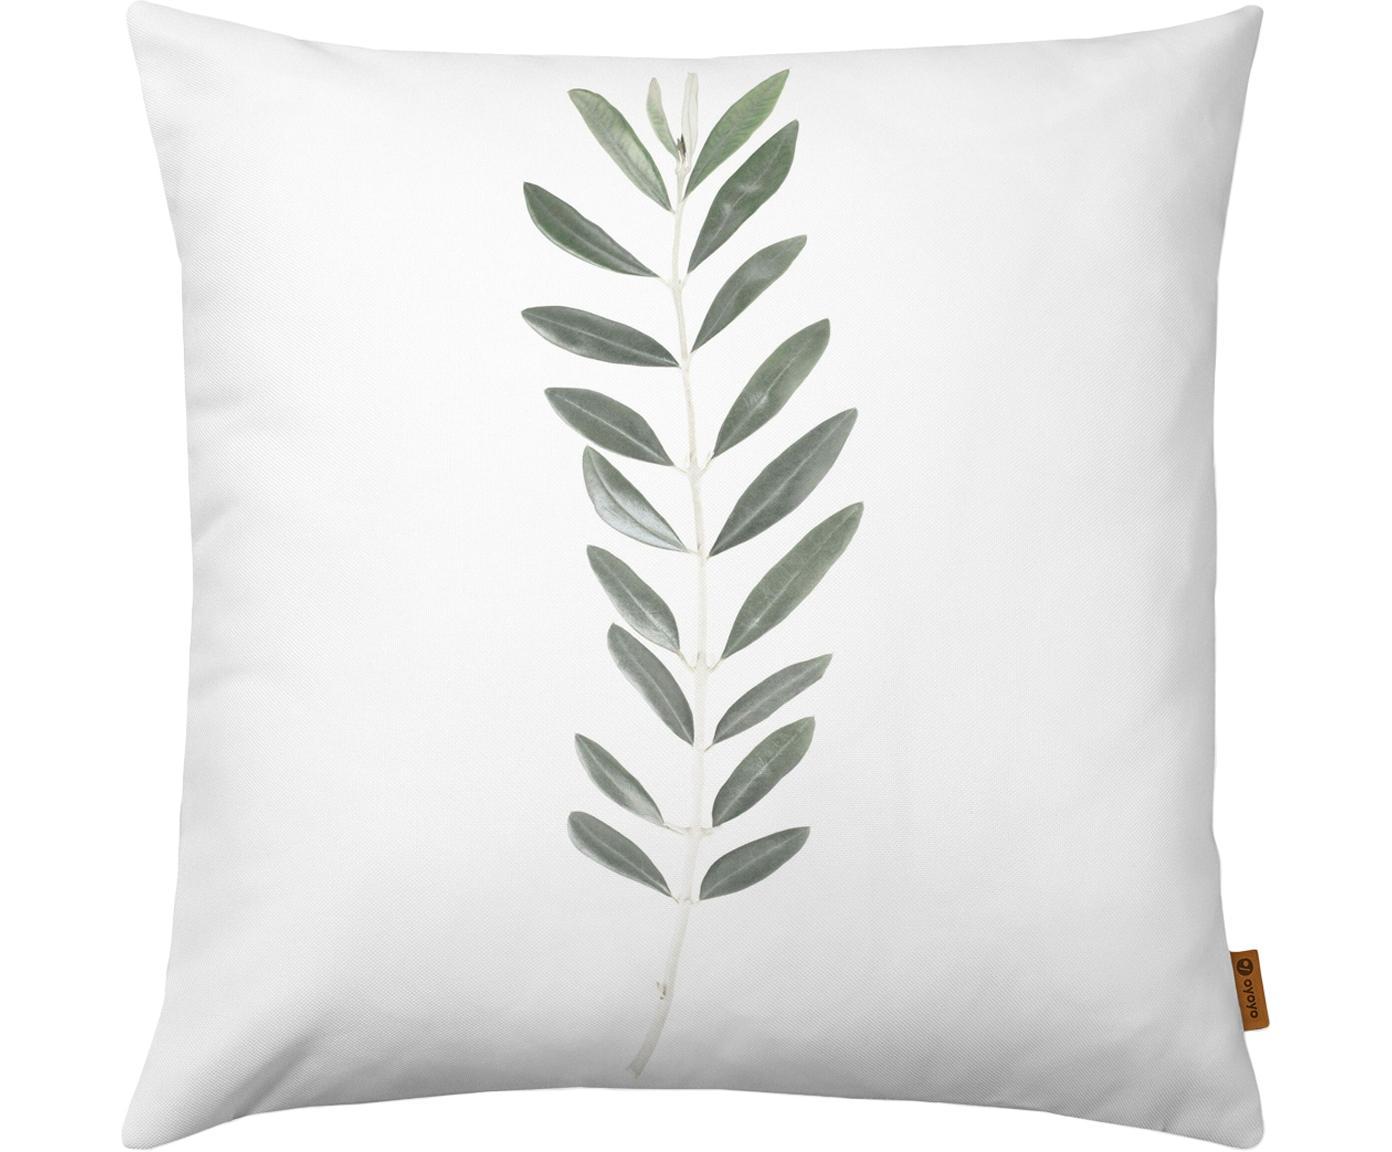 Kissenhülle Botanical mit Olivenzweig, 100% Polyester, Weiß, Grün, 40 x 40 cm